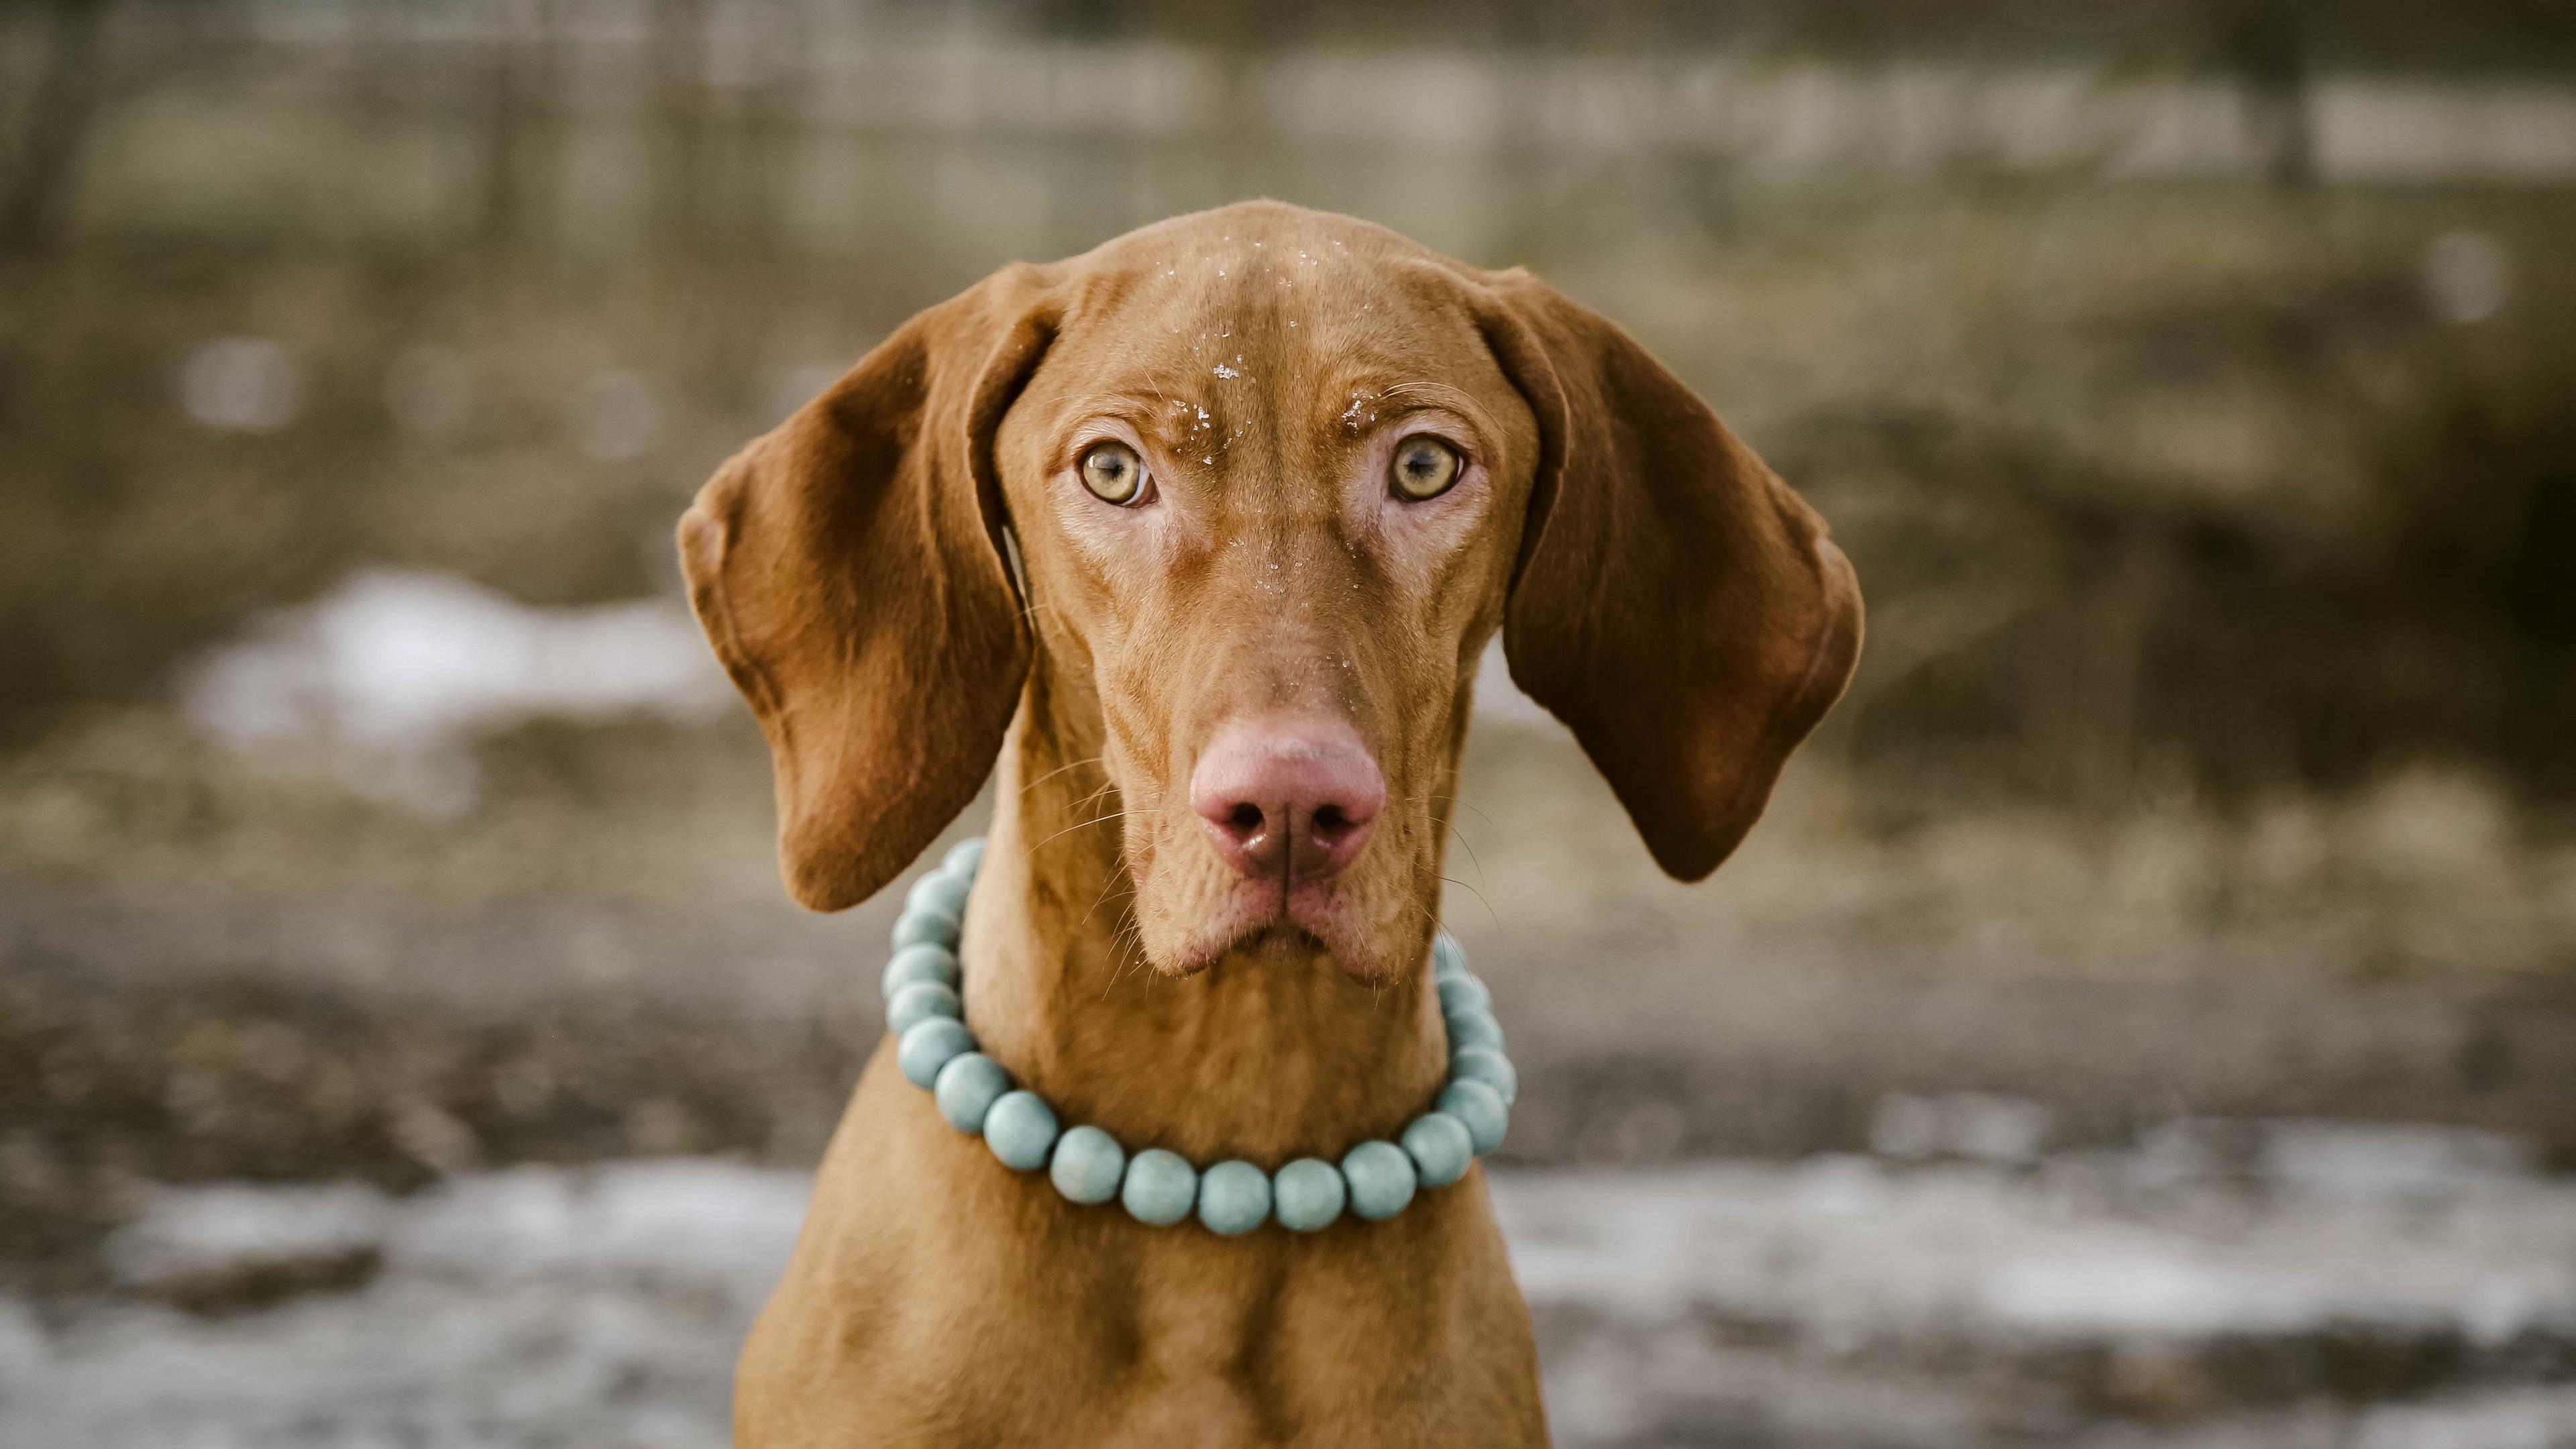 dog muzzle collar necklace 4k 1542243027 - dog, muzzle, collar, necklace 4k - muzzle, Dog, collar